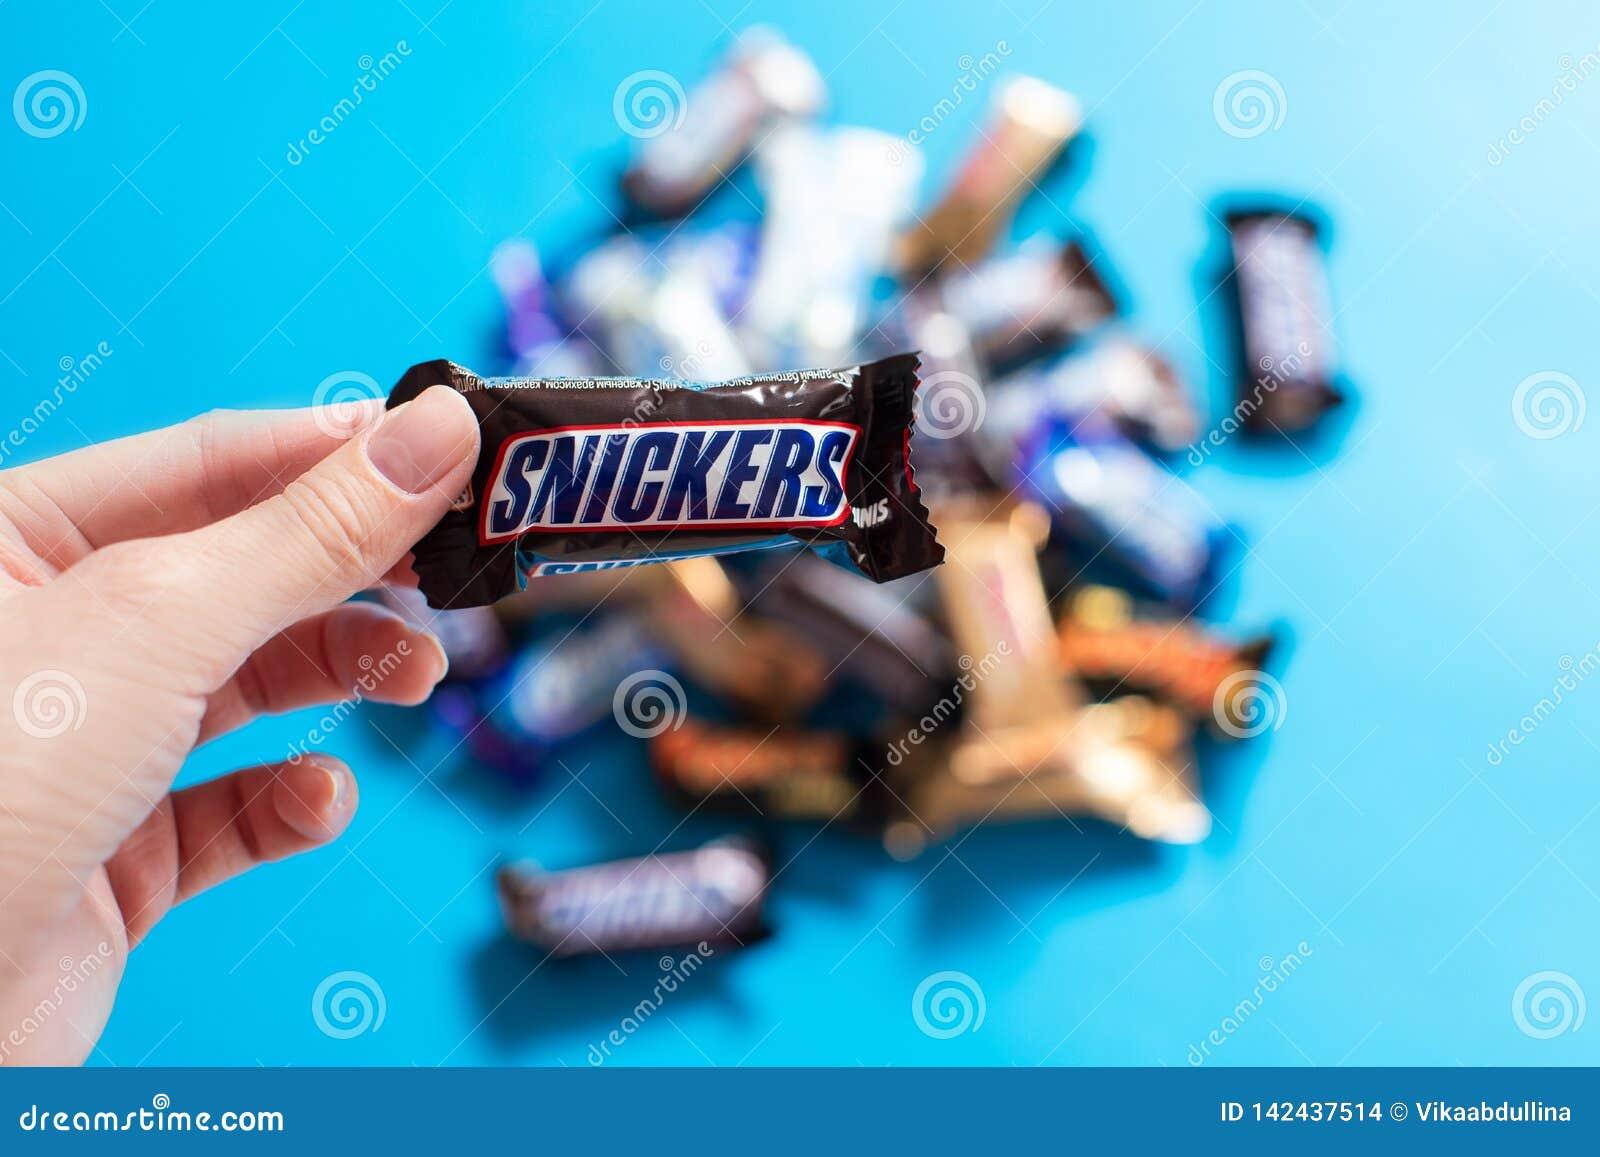 Snickers υπό εξέταση - δημοφιλείς μίνι φραγμοί σοκολάτας καραμελών στο μπλε υπόβαθρο